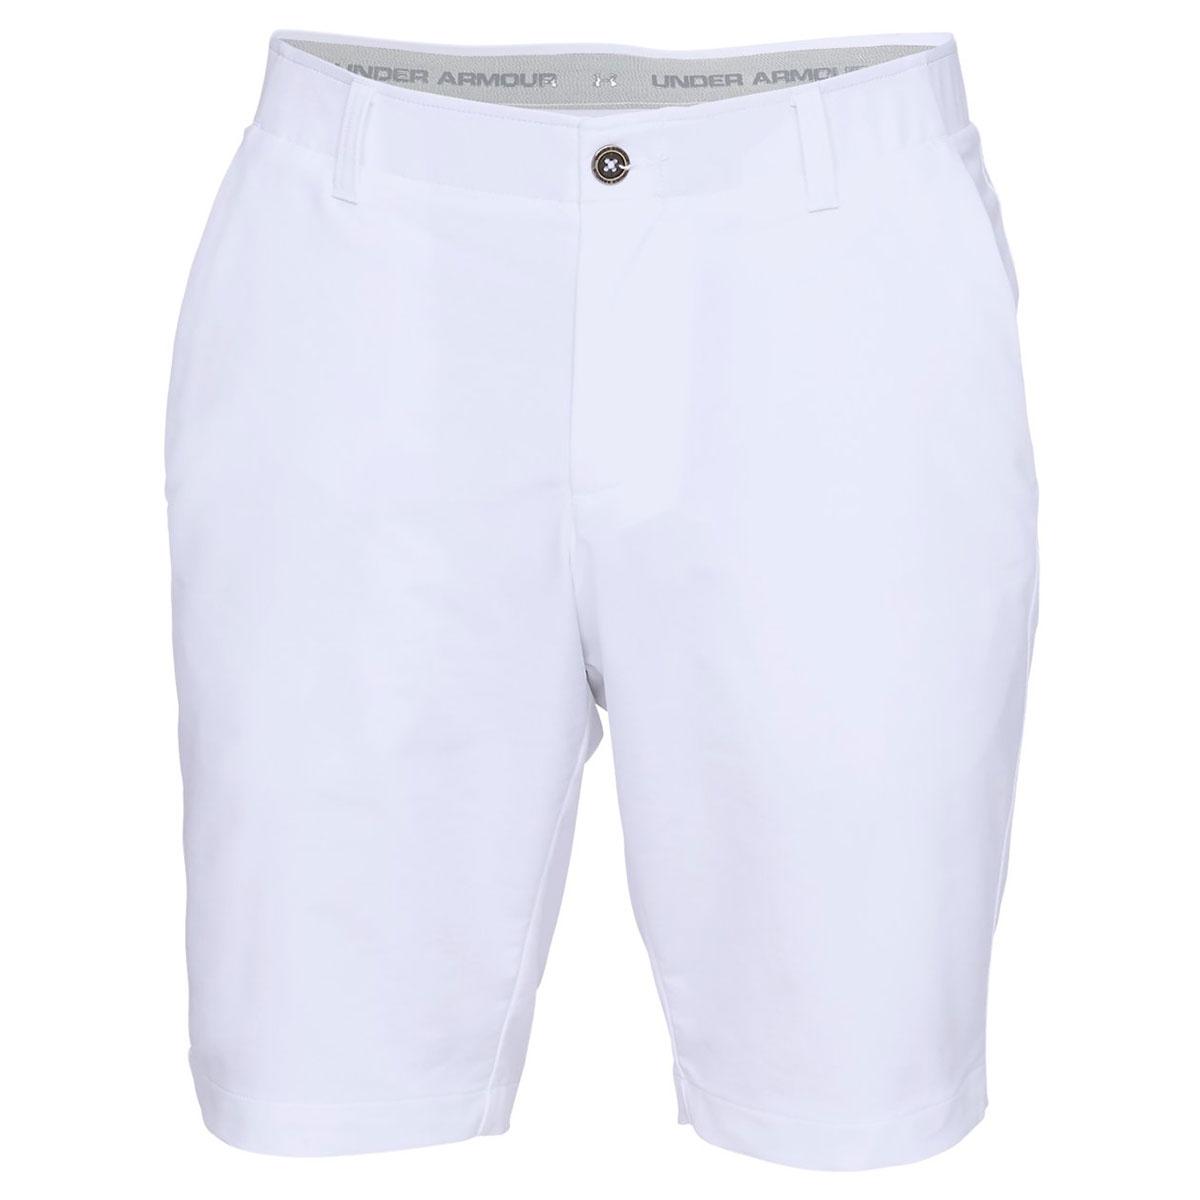 Under-Armour-Mens-2019-EU-Performance-Taper-Stretch-Soft-Comfort-Golf-Shorts thumbnail 16